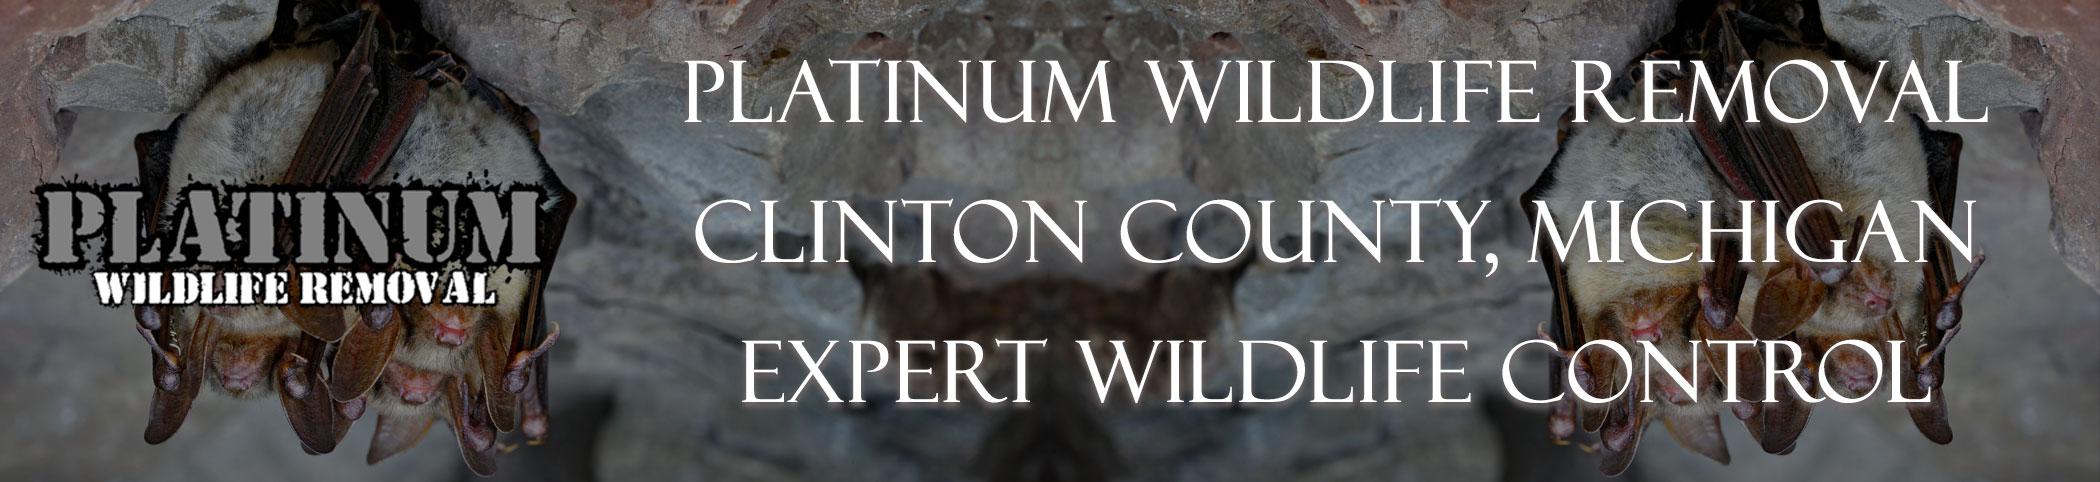 Clinton-County-Michigan-Bat-Removal-header-Image